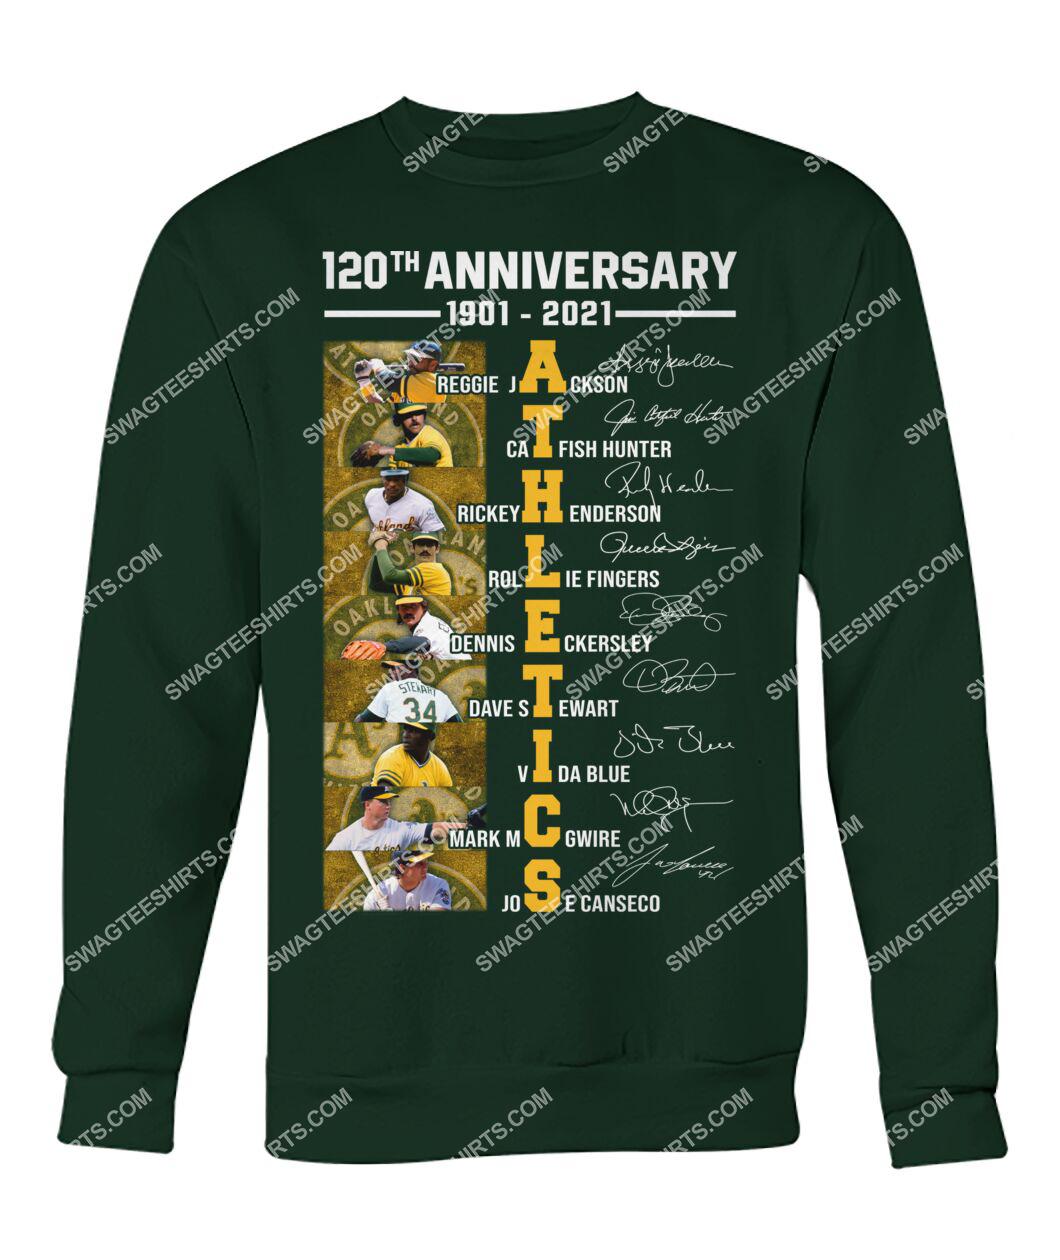 the oakland athletics 120th anniversary 1901 2021 signatures mlb sweatshirt 1